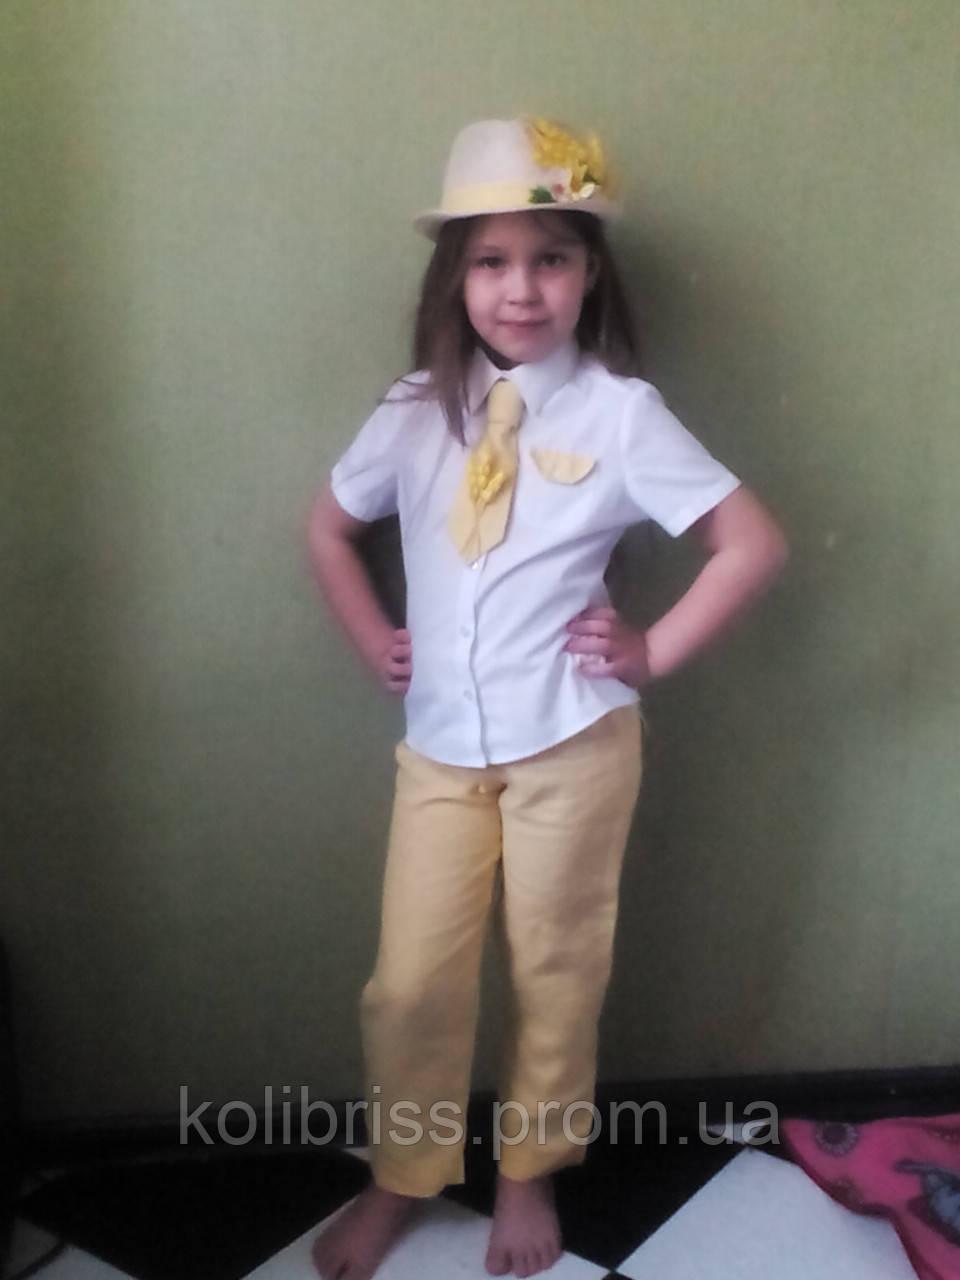 Костюм пшенички прокат Киев, костюм колосок прокат